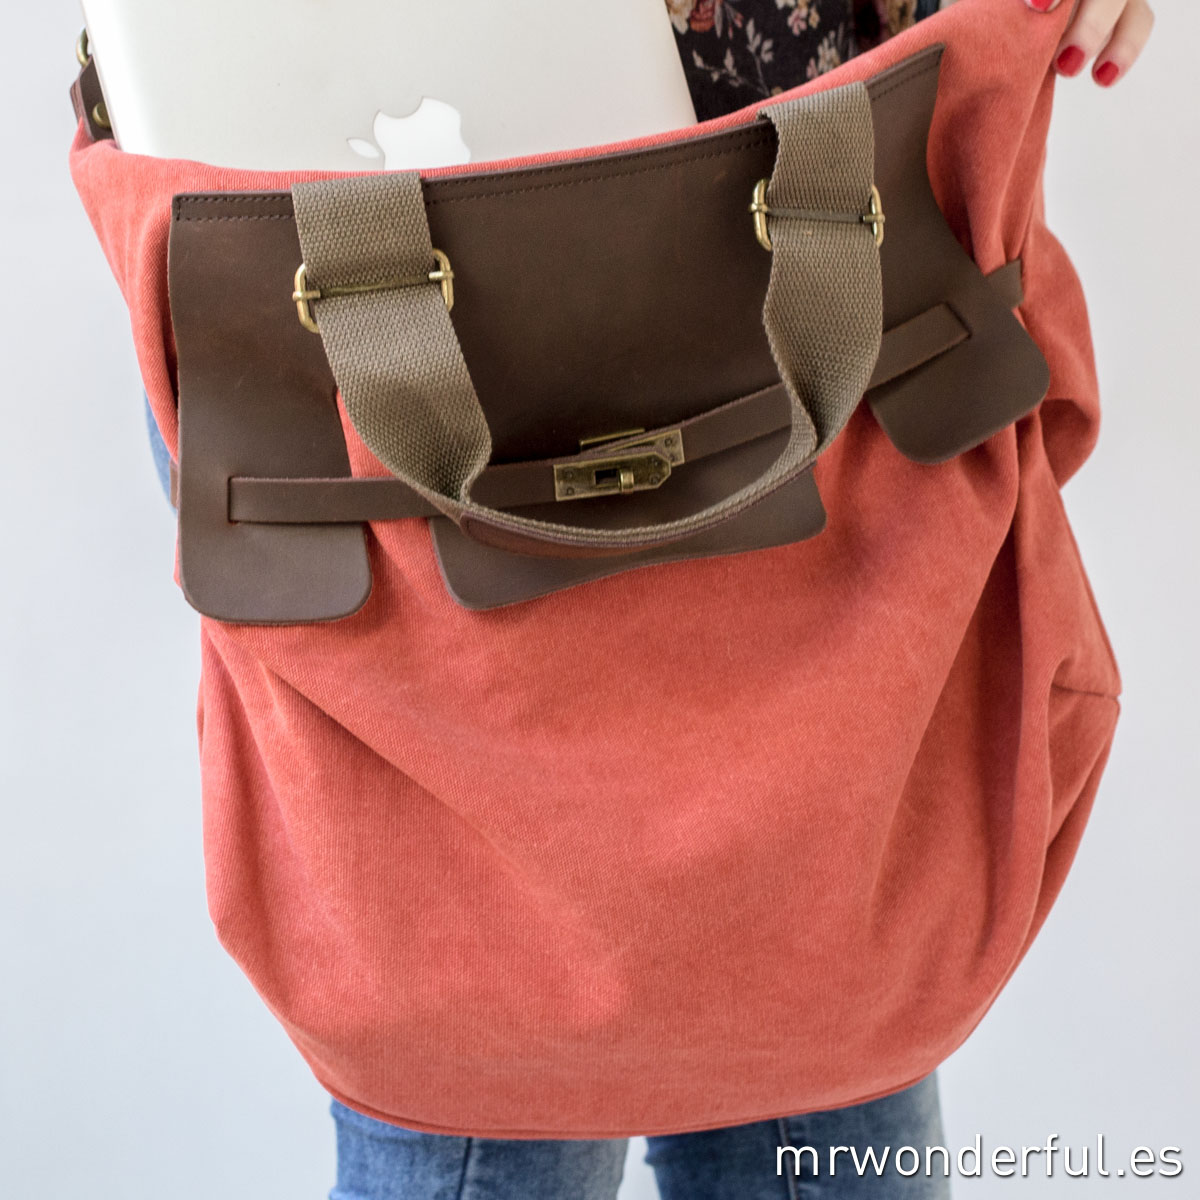 mrwonderful_bags_W2042-Corail-27